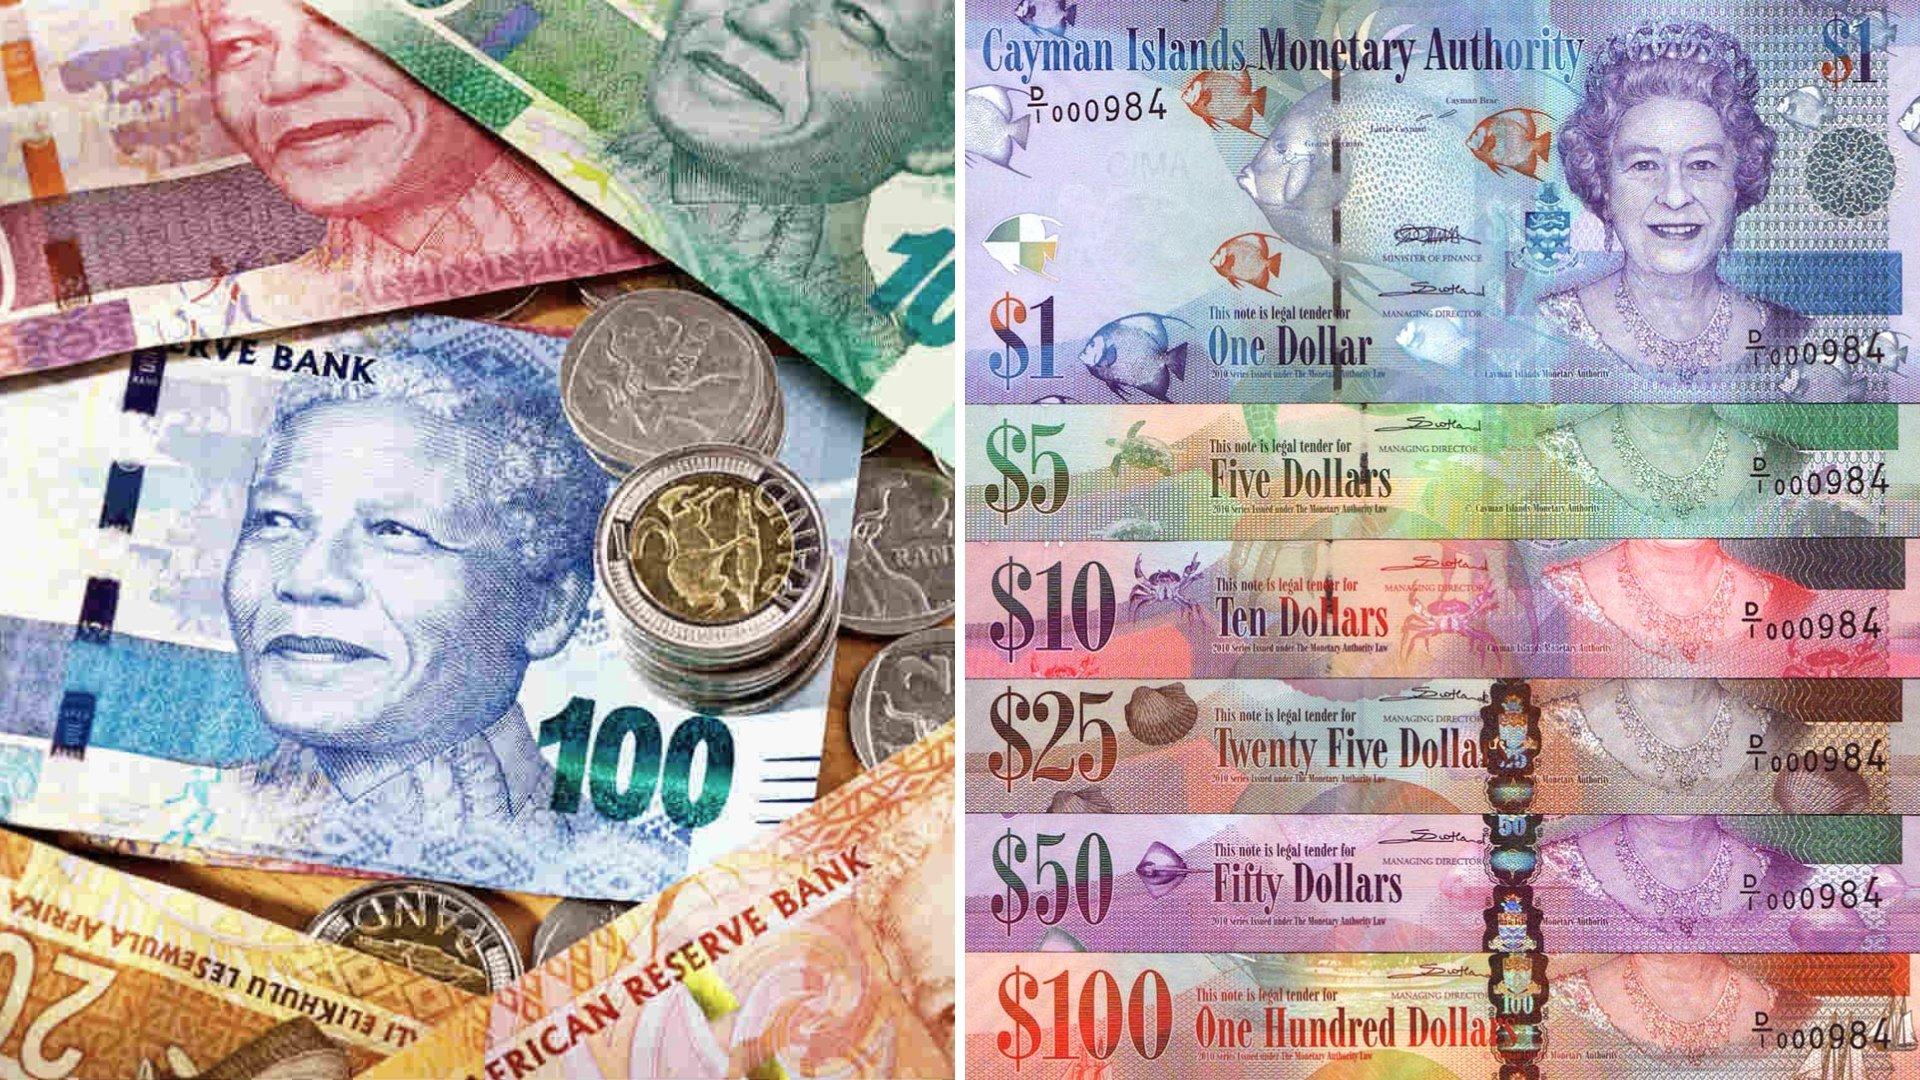 South African va Cayman Islands Money-1